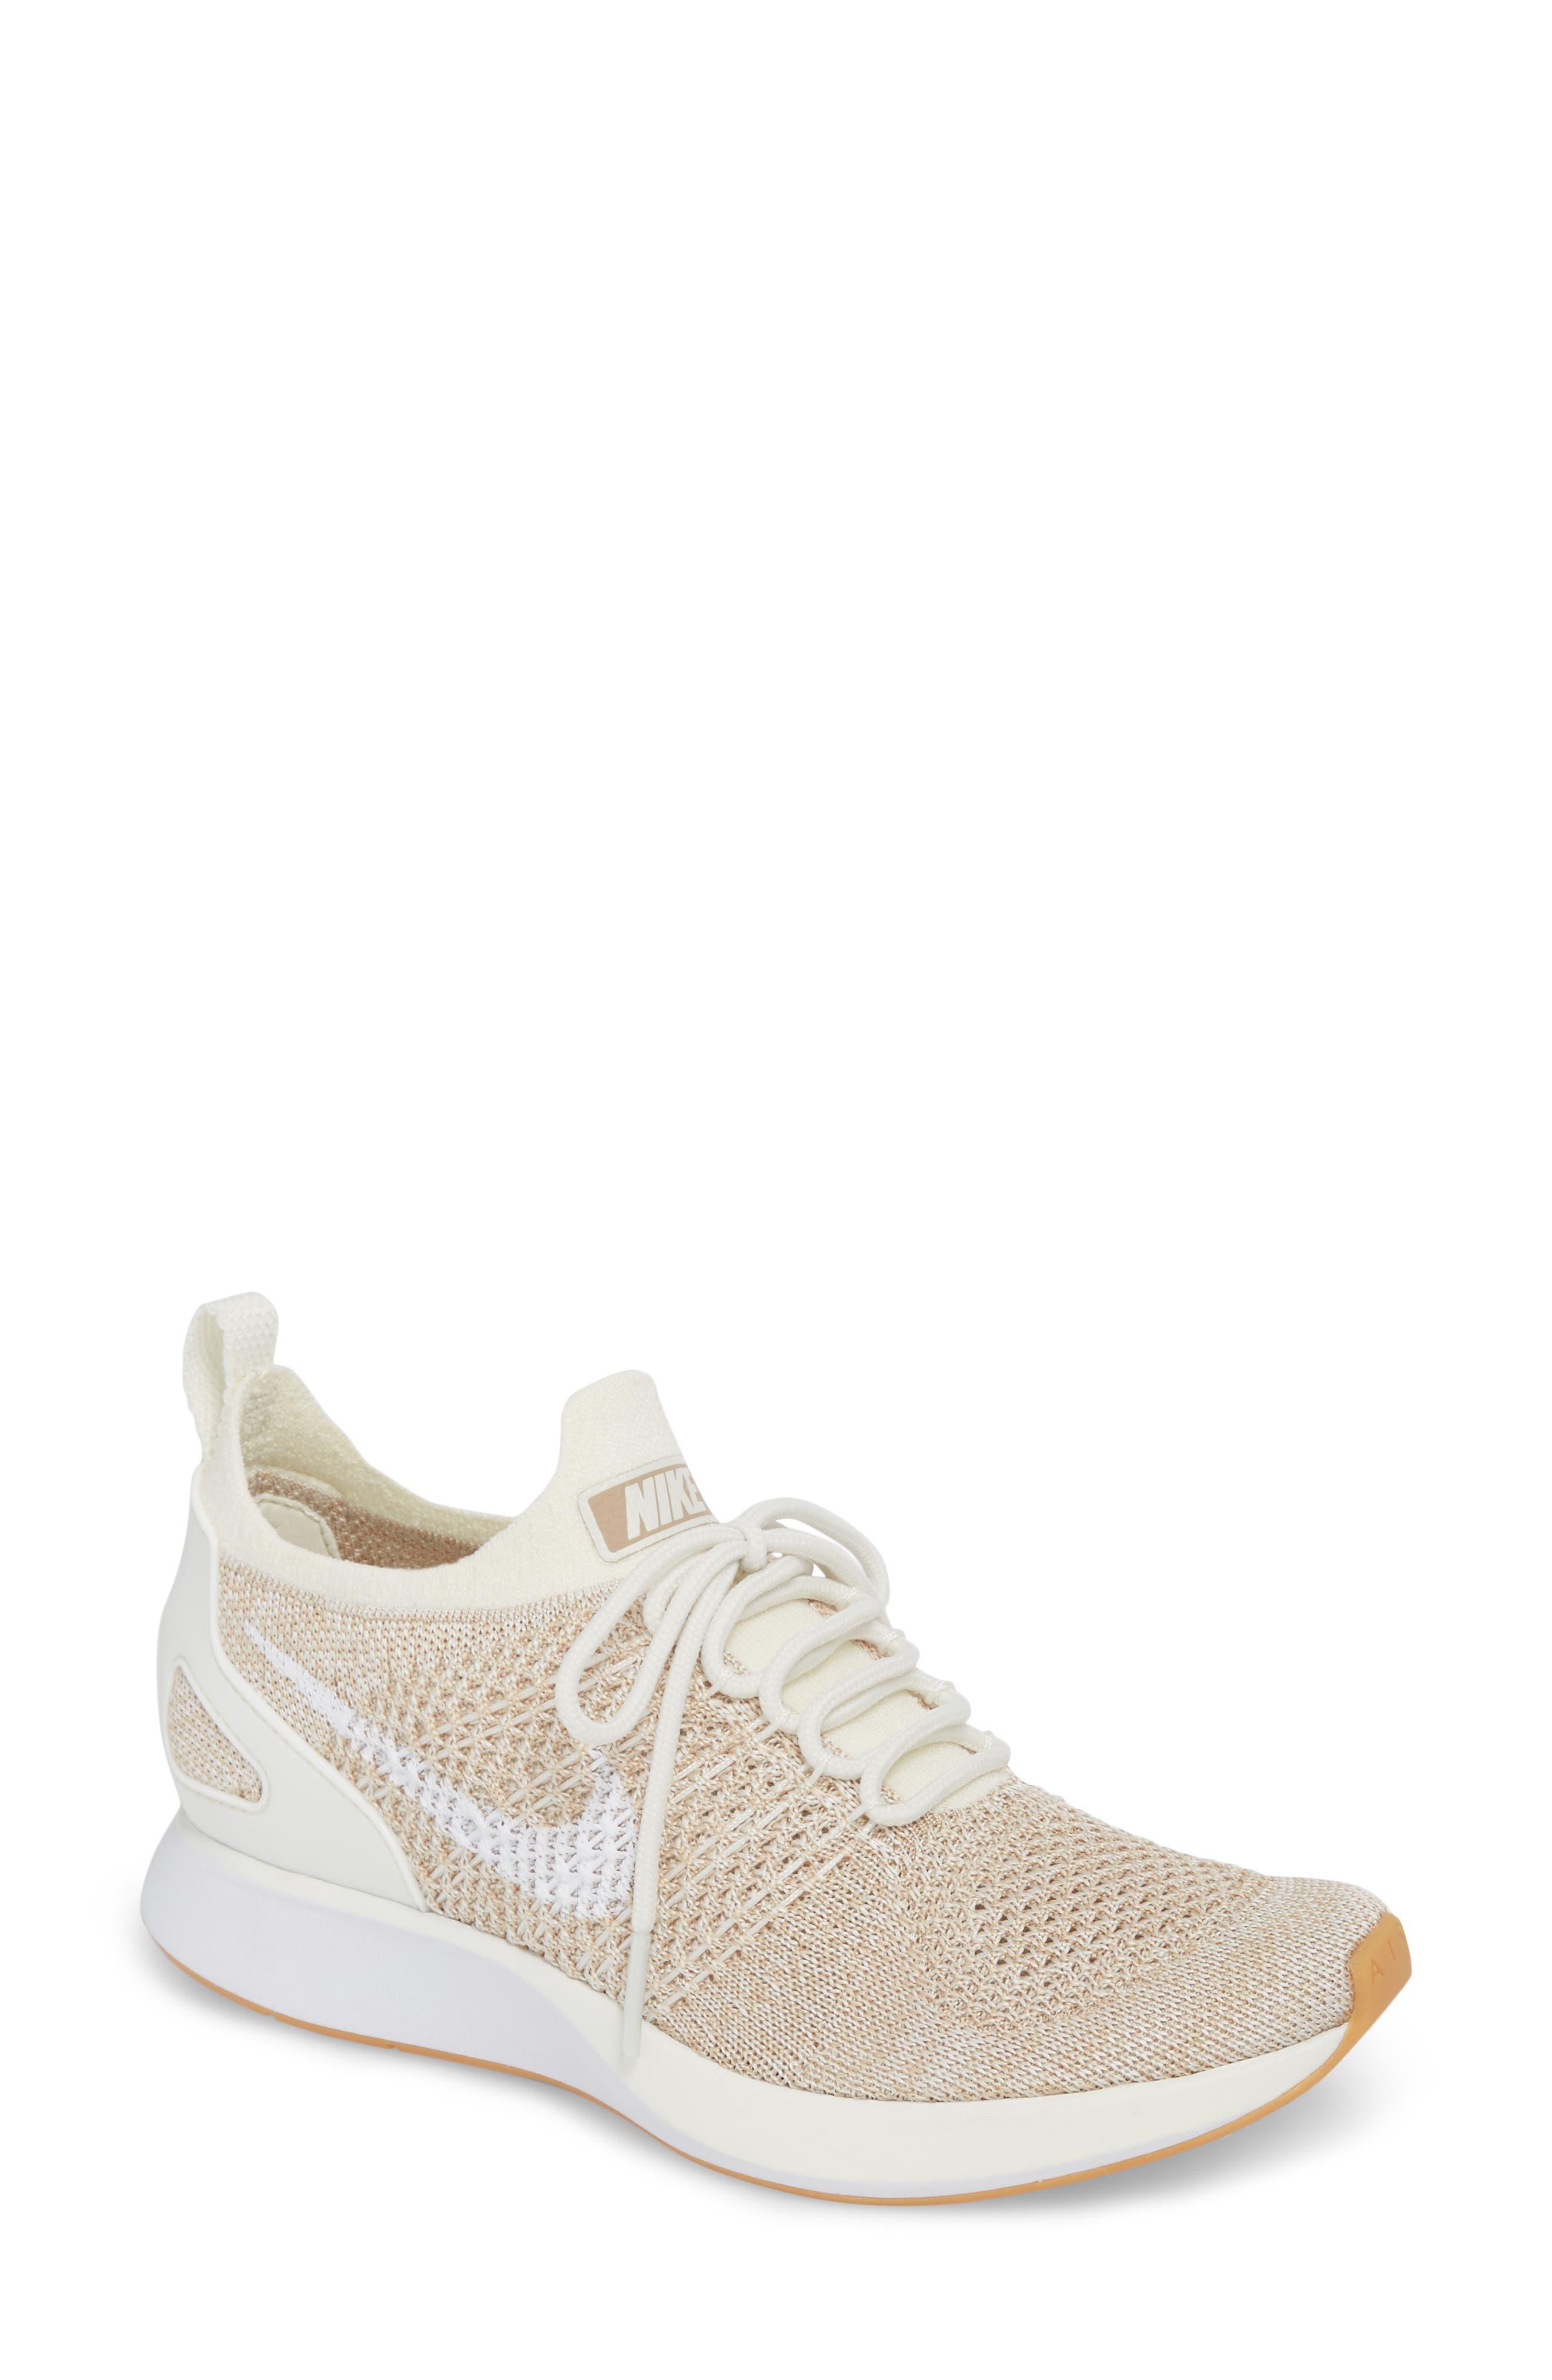 Air Zoom Mariah Flyknit Racer Sneaker,                             Main thumbnail 1, color,                             Sail/ White/ Sand